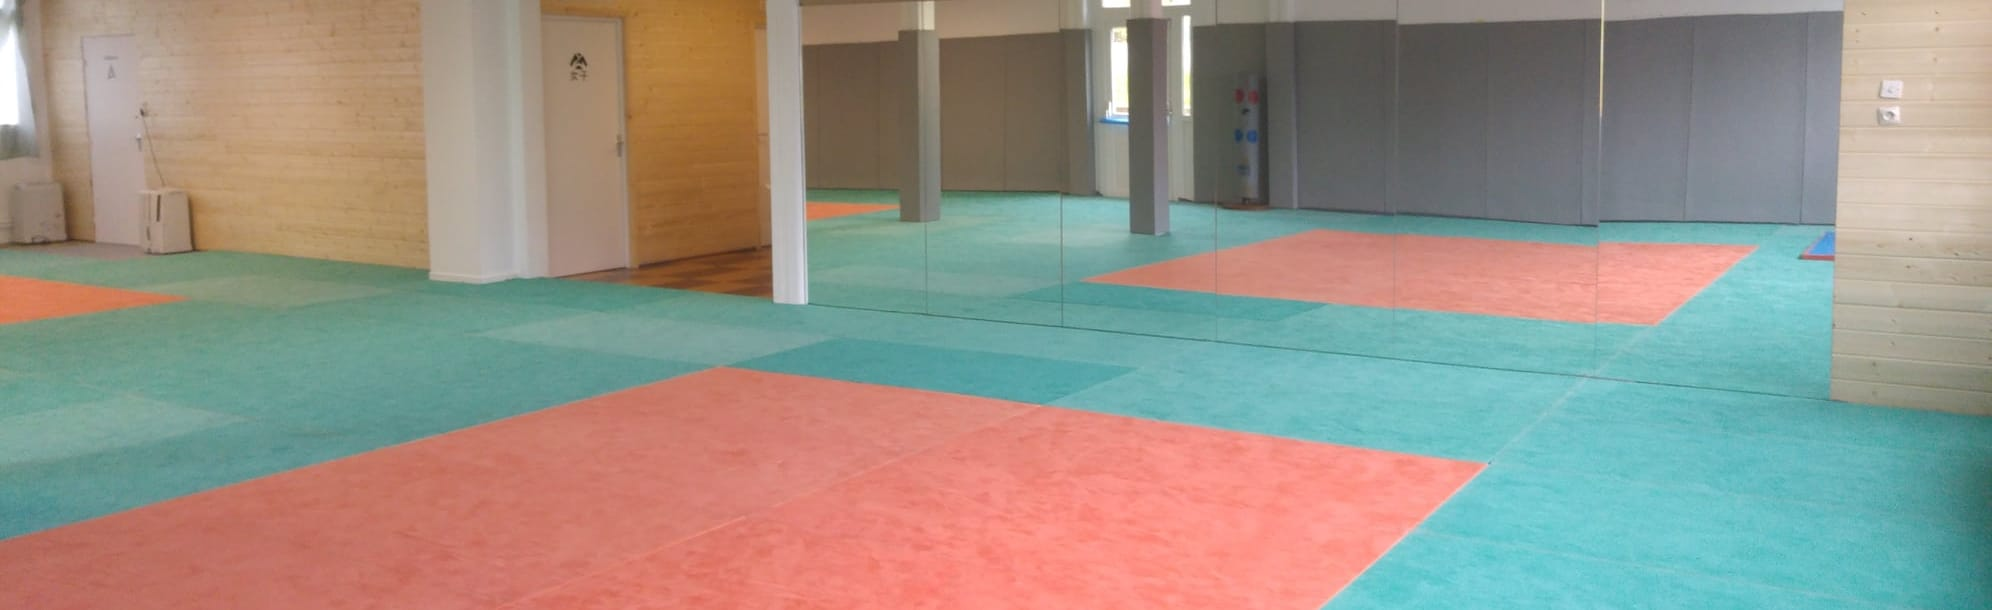 Karate Tai Jitsu d'Eperlecques